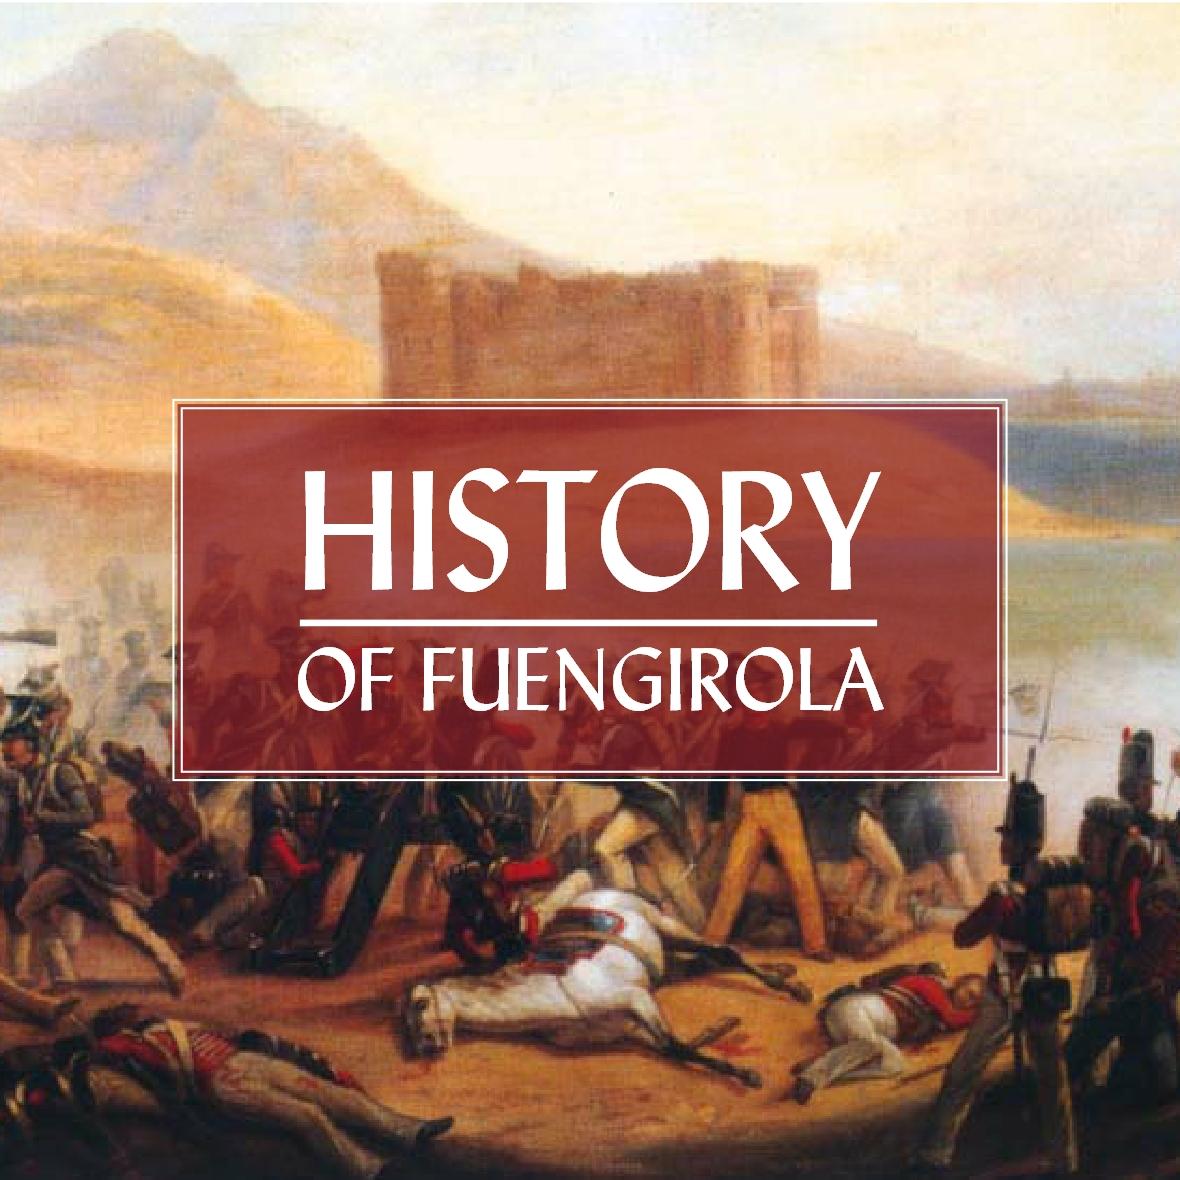 History of Fuengirola